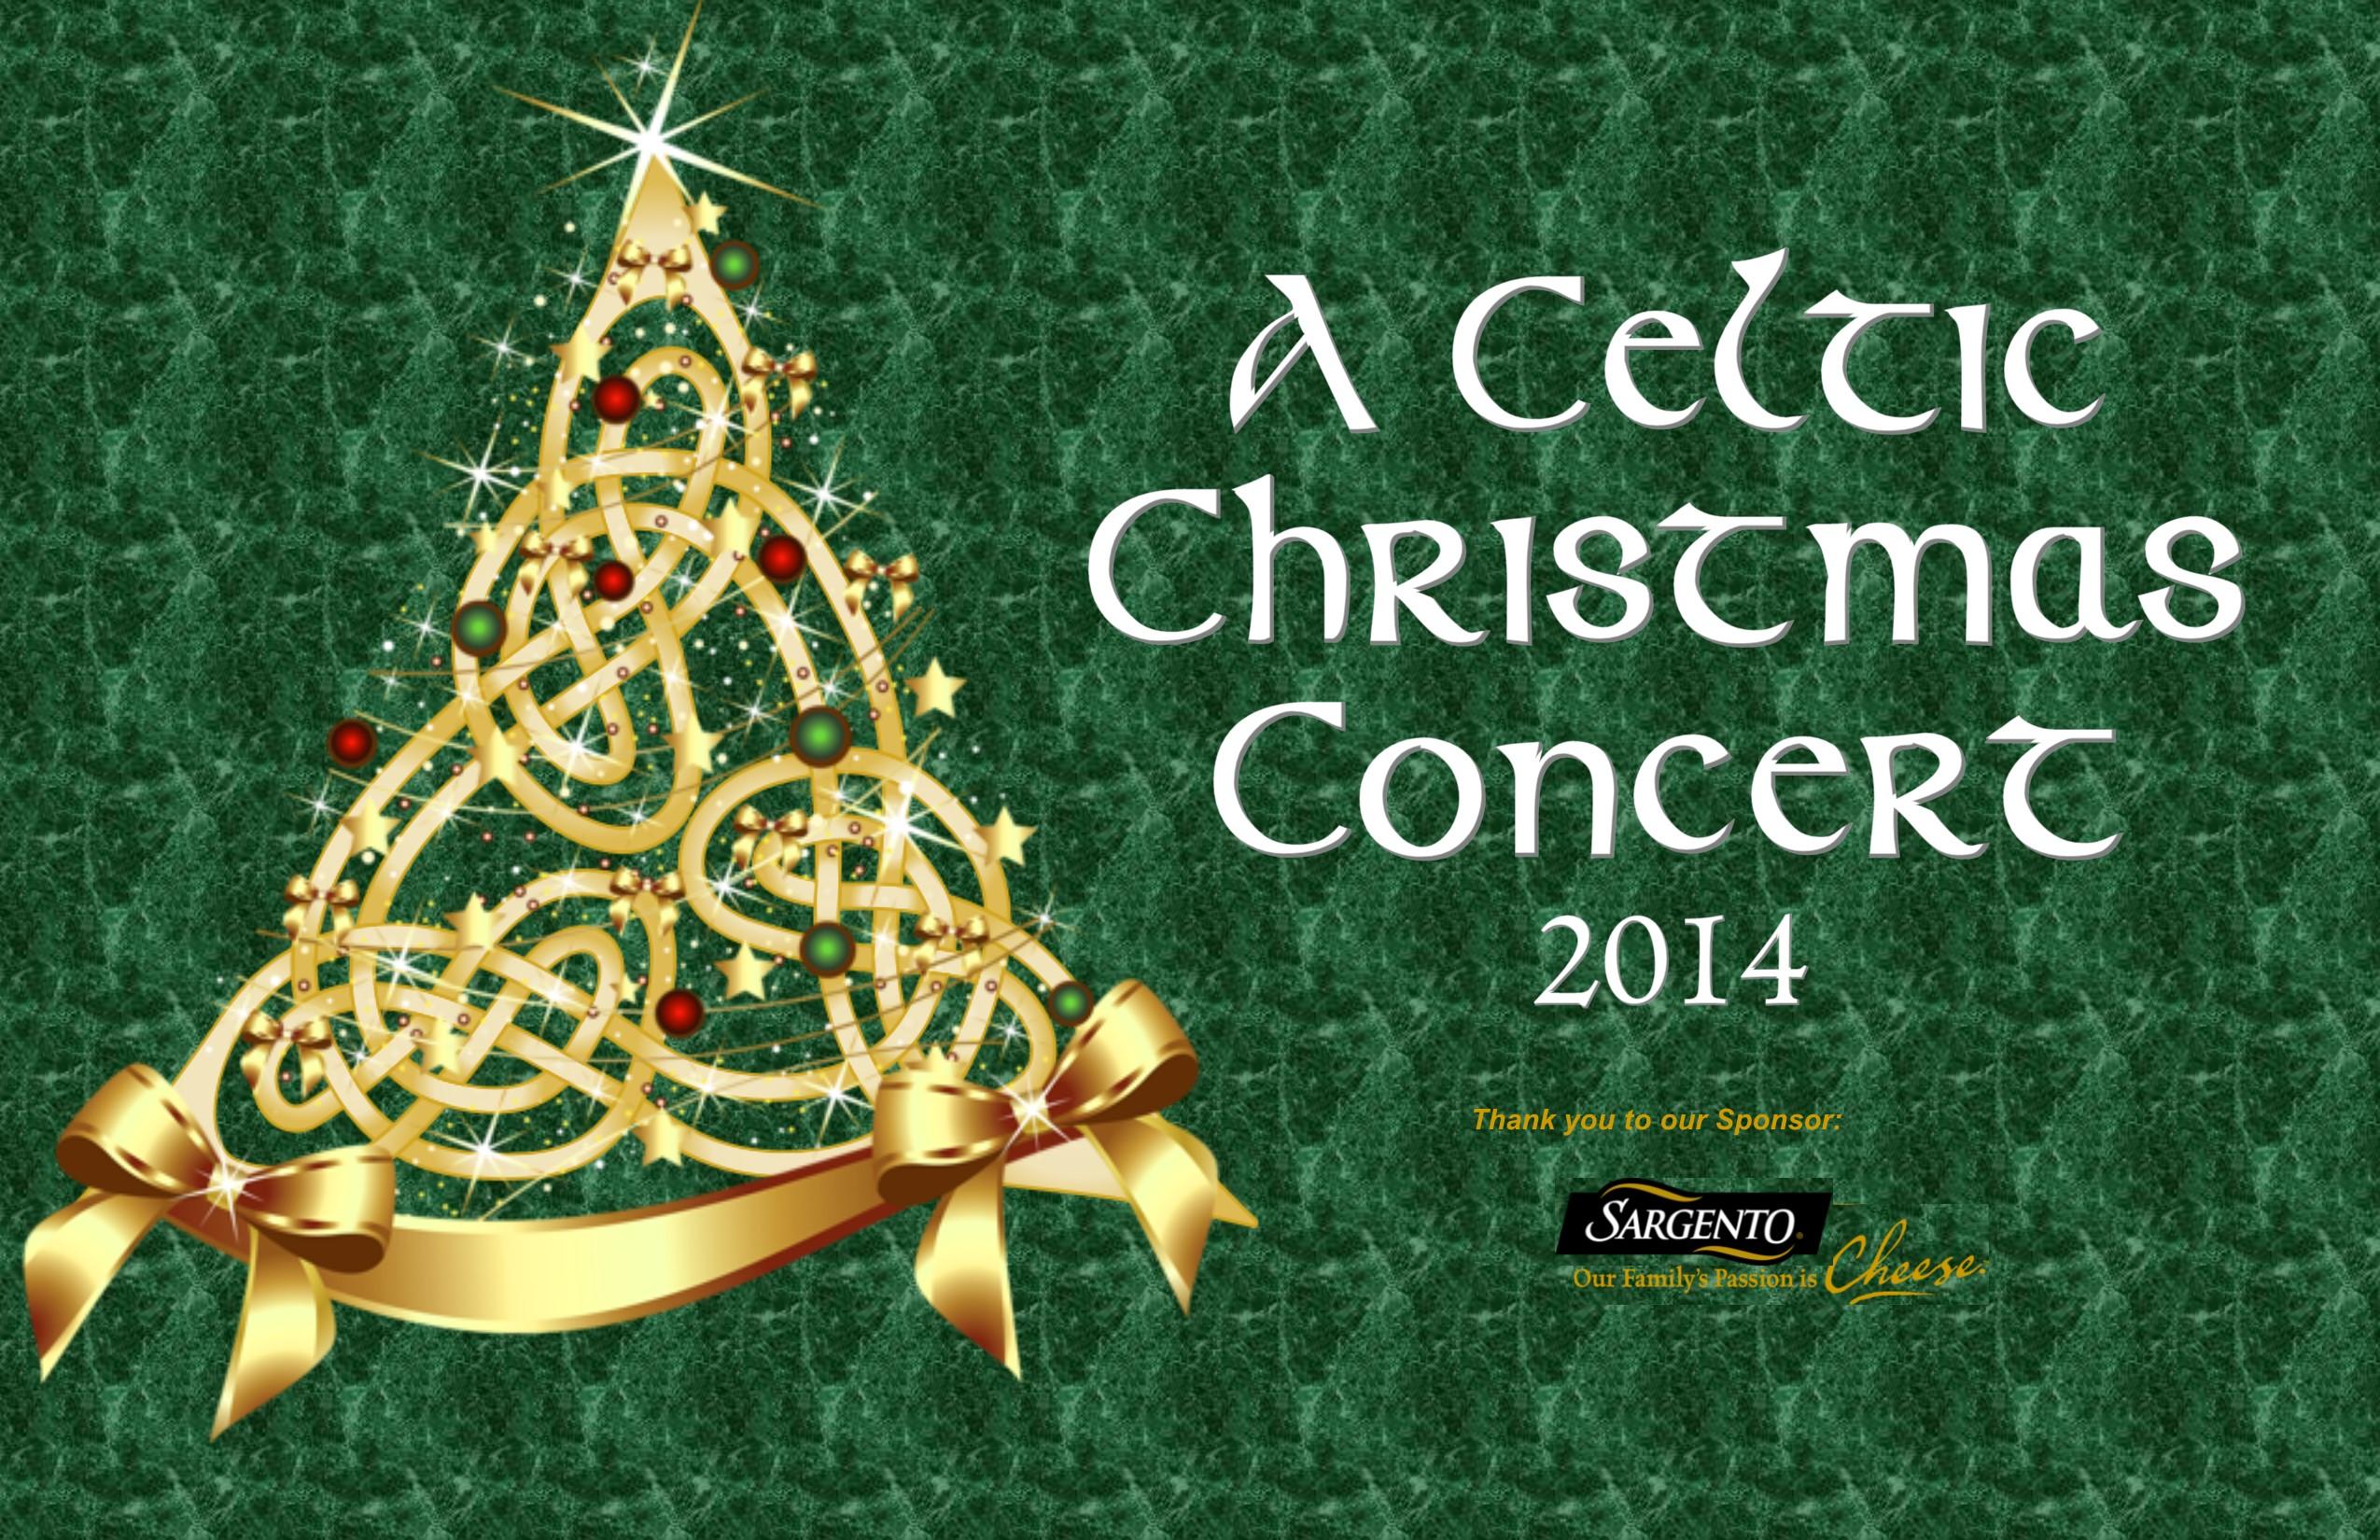 Celtic Christmas.A Celtic Christmas 2014